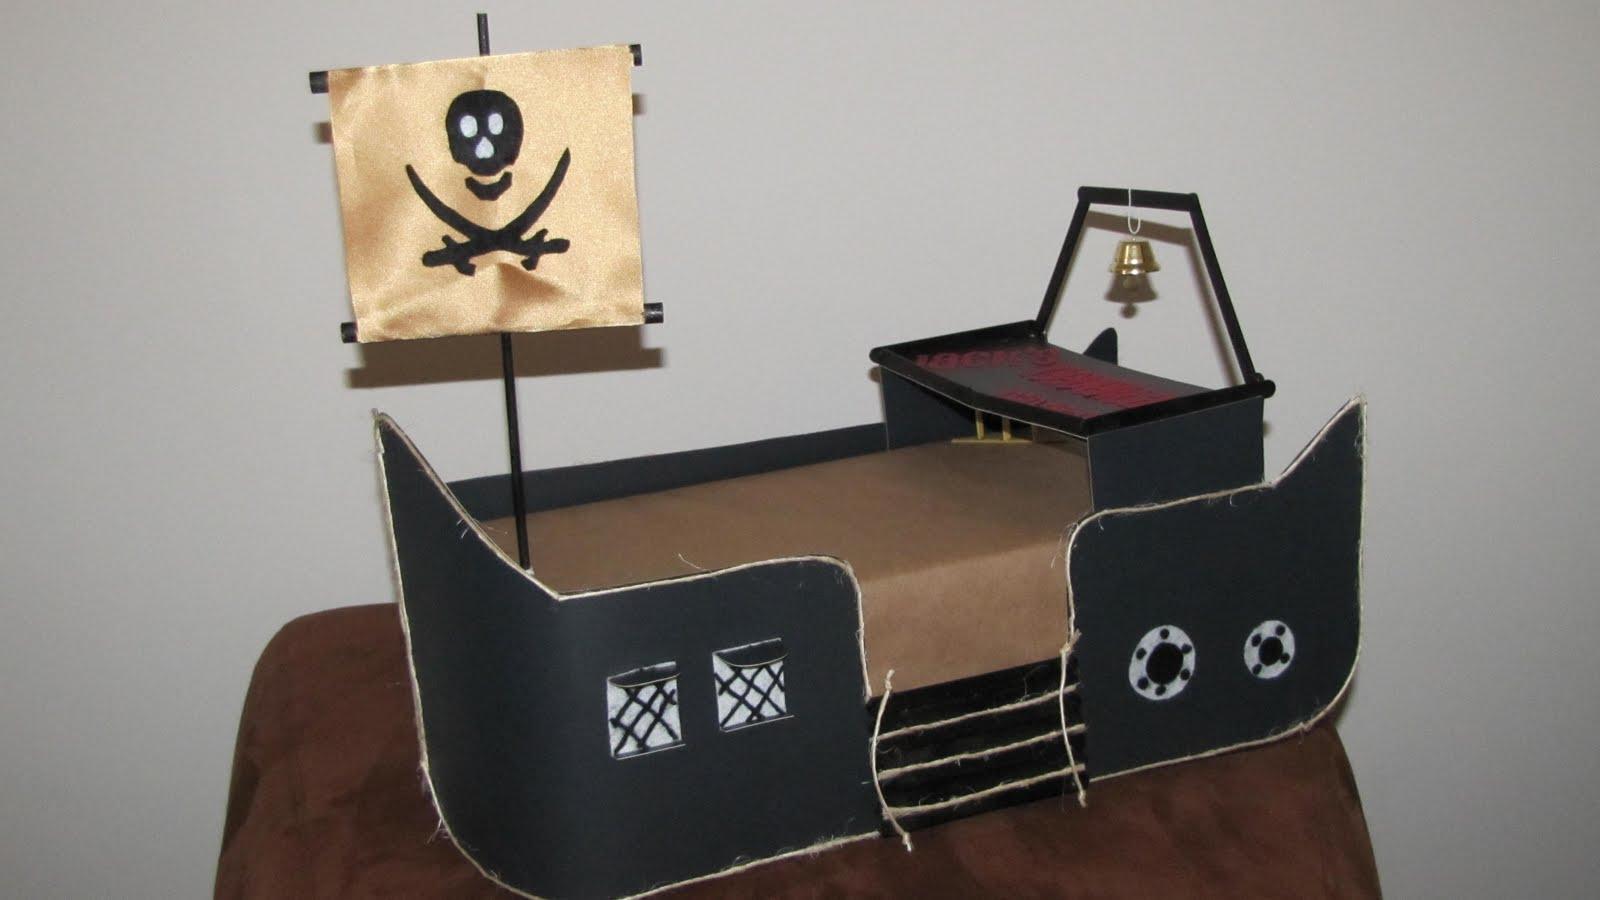 Pirate Ship Cake Stand